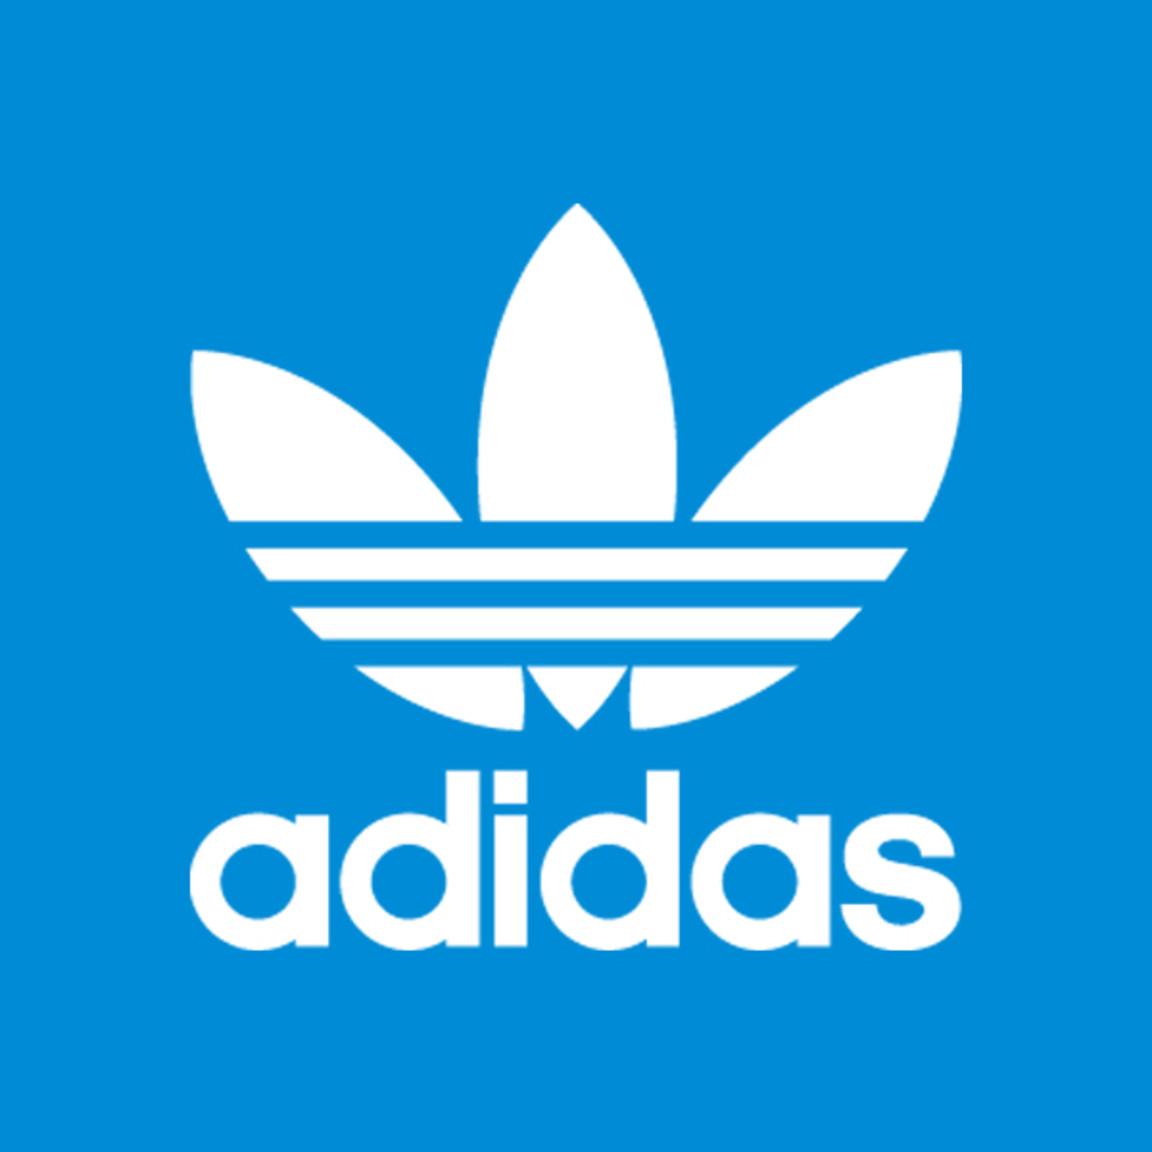 Adidas Originals At Westfield Chermside